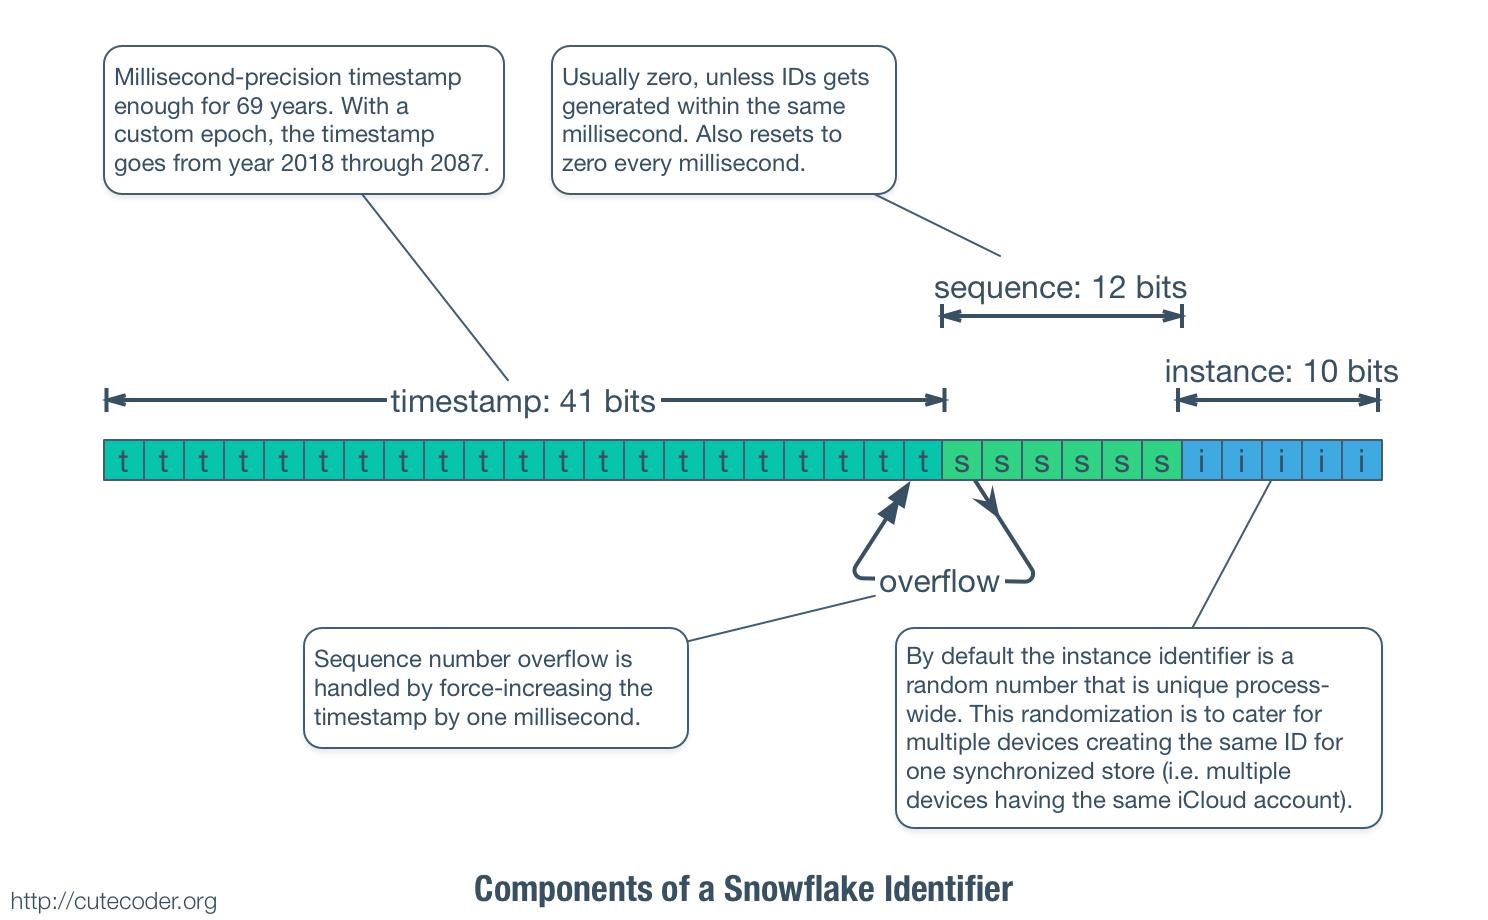 Snowflake identifier 2x